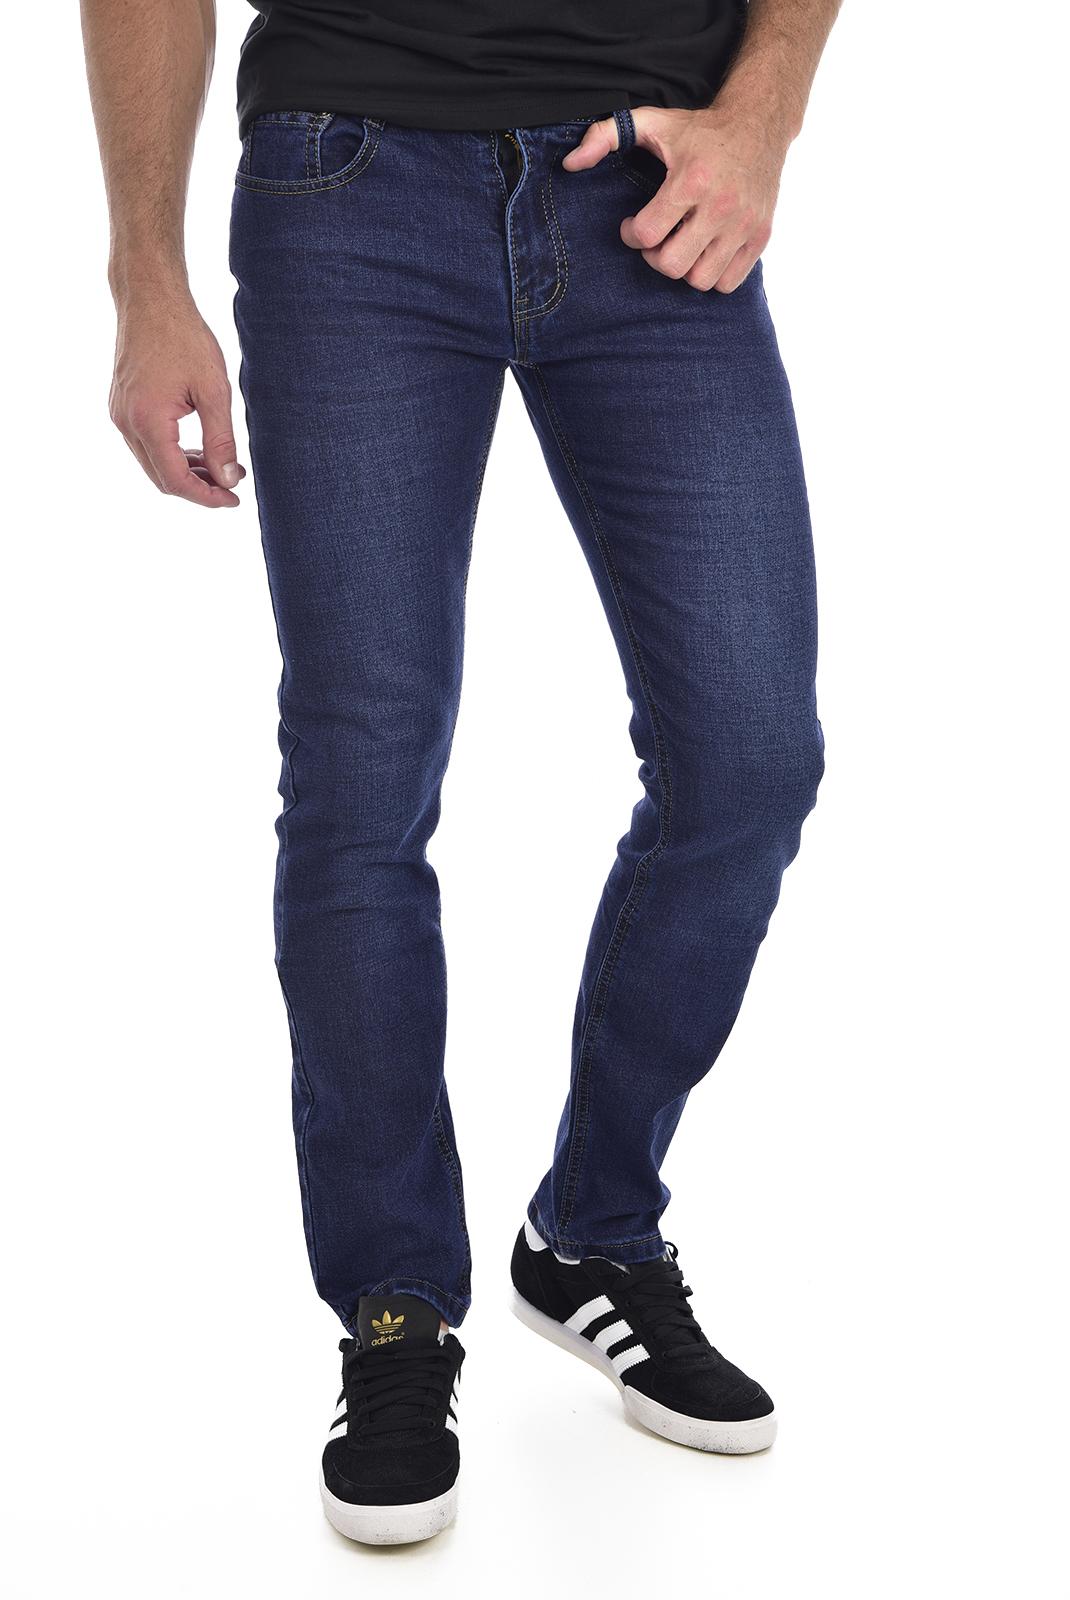 Jeans  Giani 5 C201 bleu